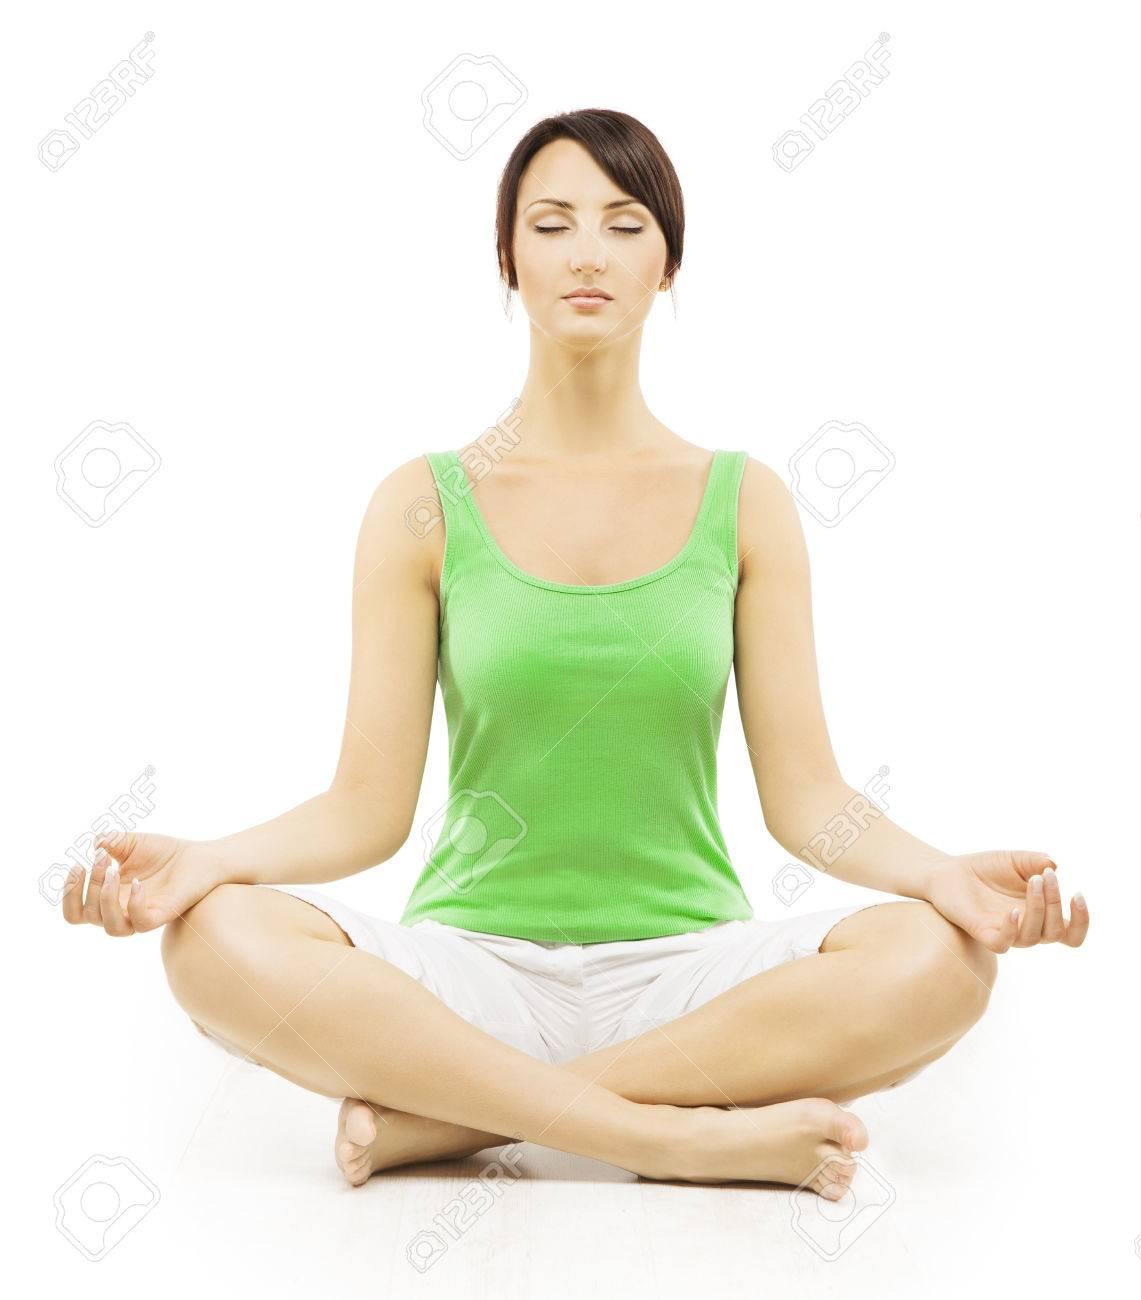 yoga woman in meditation sitting in lotus pose female meditating